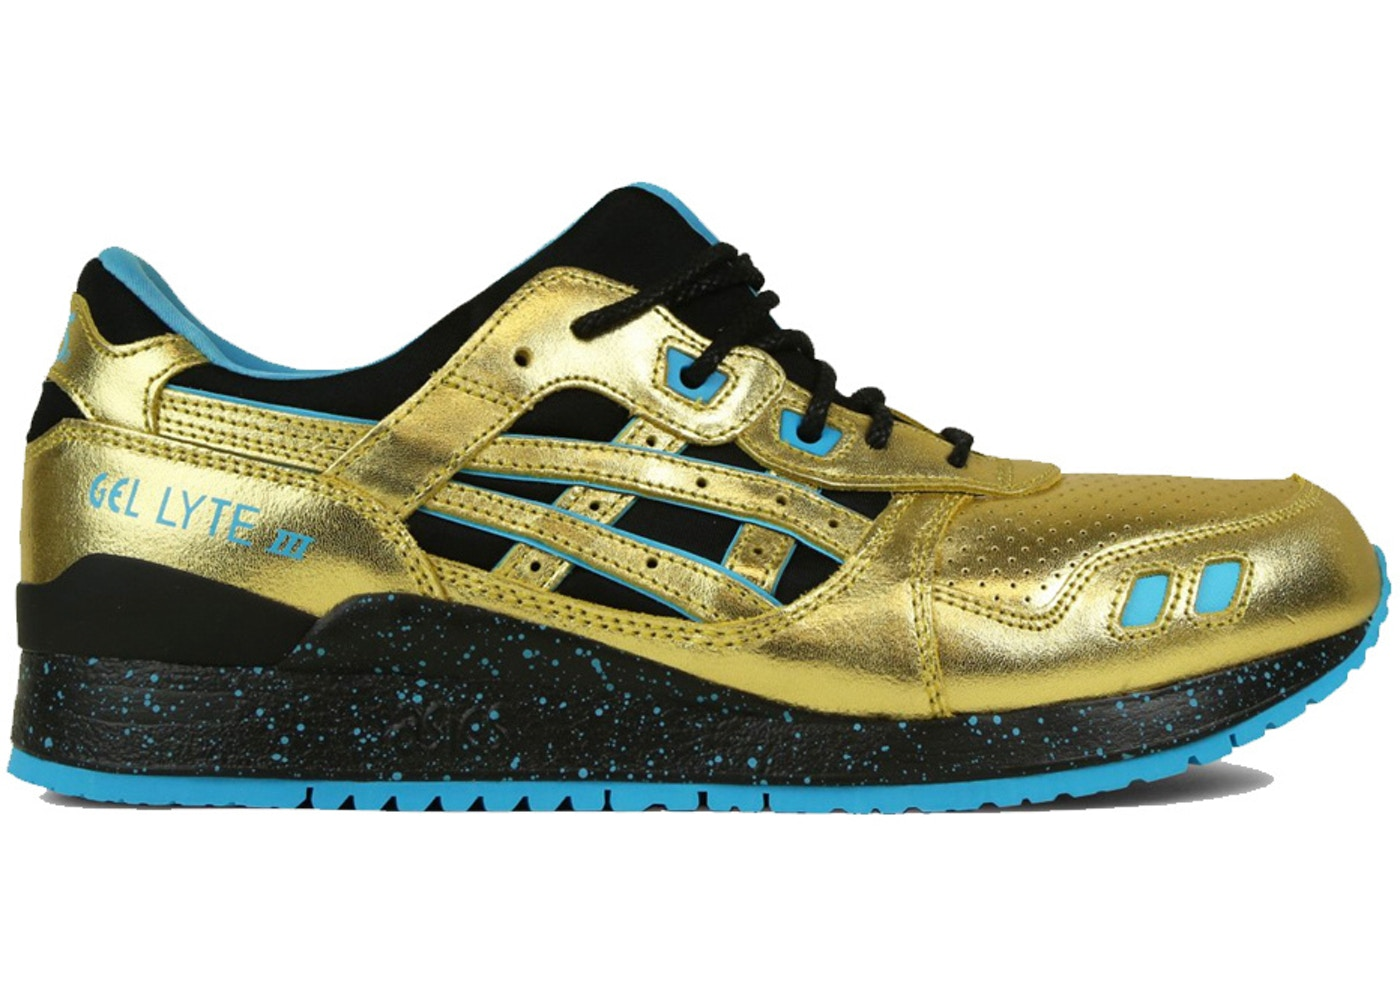 cheaper 9a57a e36b3 ASICS Shoes - Most Popular